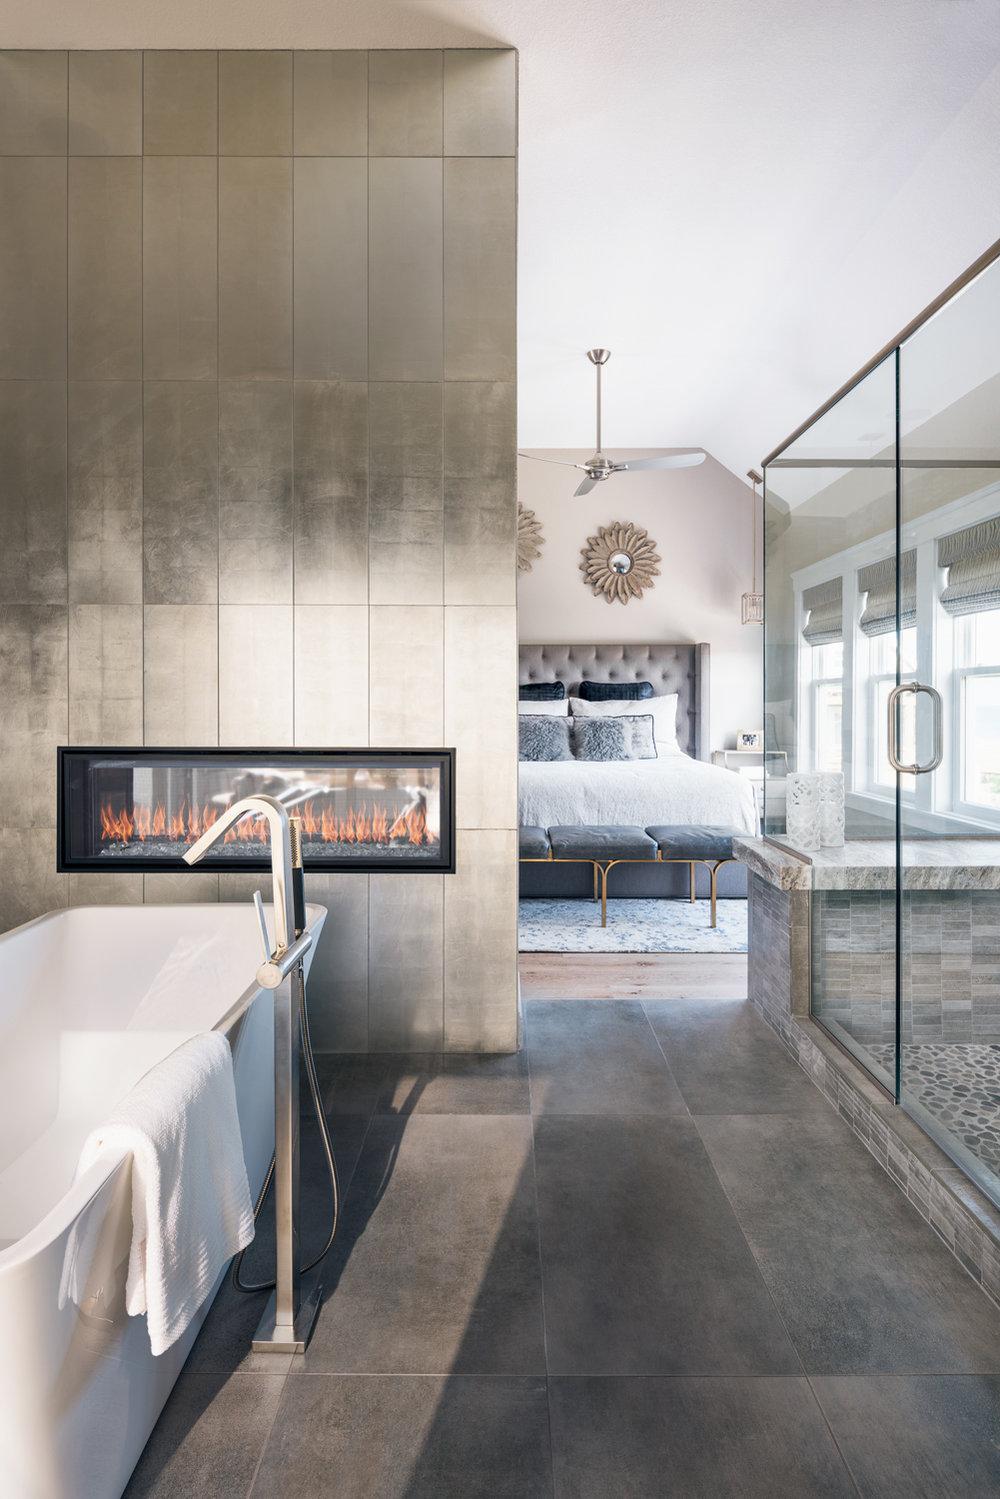 interior-bathroom-vignette.jpg